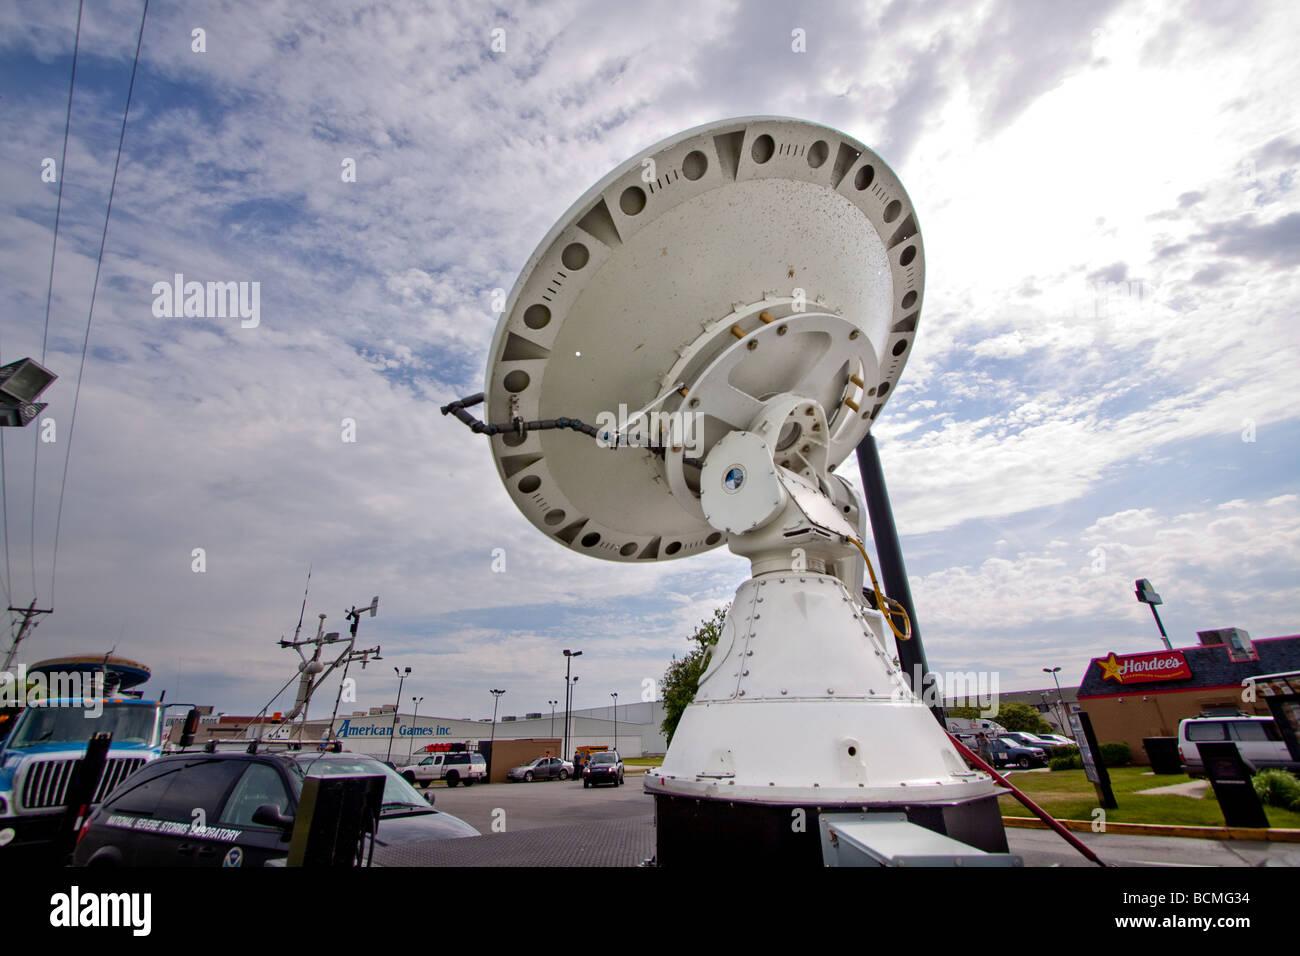 A moblie doppler radar truck dish for Project Vortex 2. - Stock Image